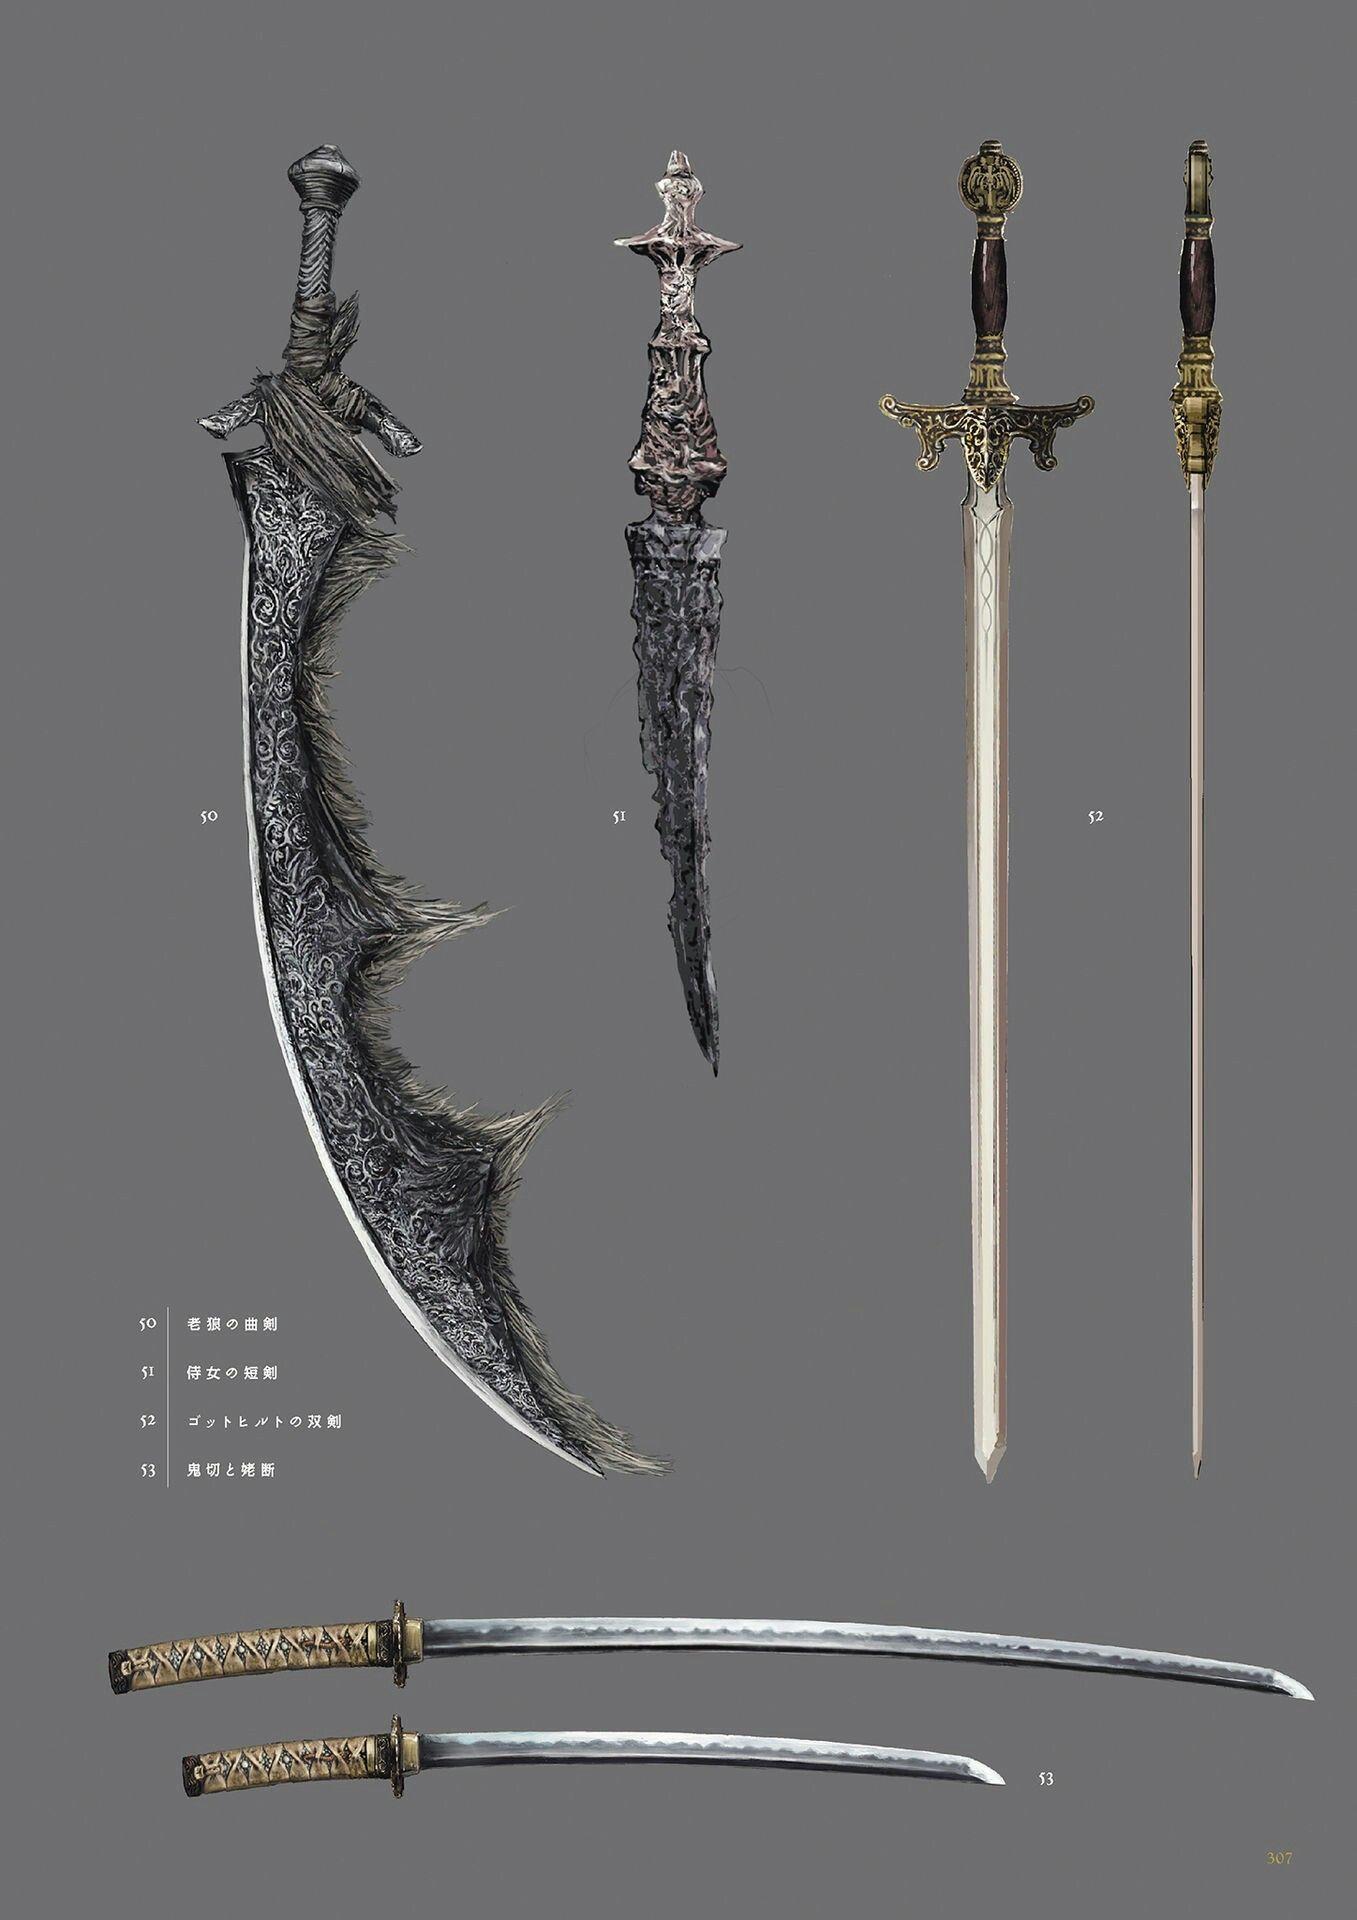 Dark Souls 3 Concept Art Weapon Concept Art Dark Souls Concept Art Weapon Concept Art Dark Souls Art